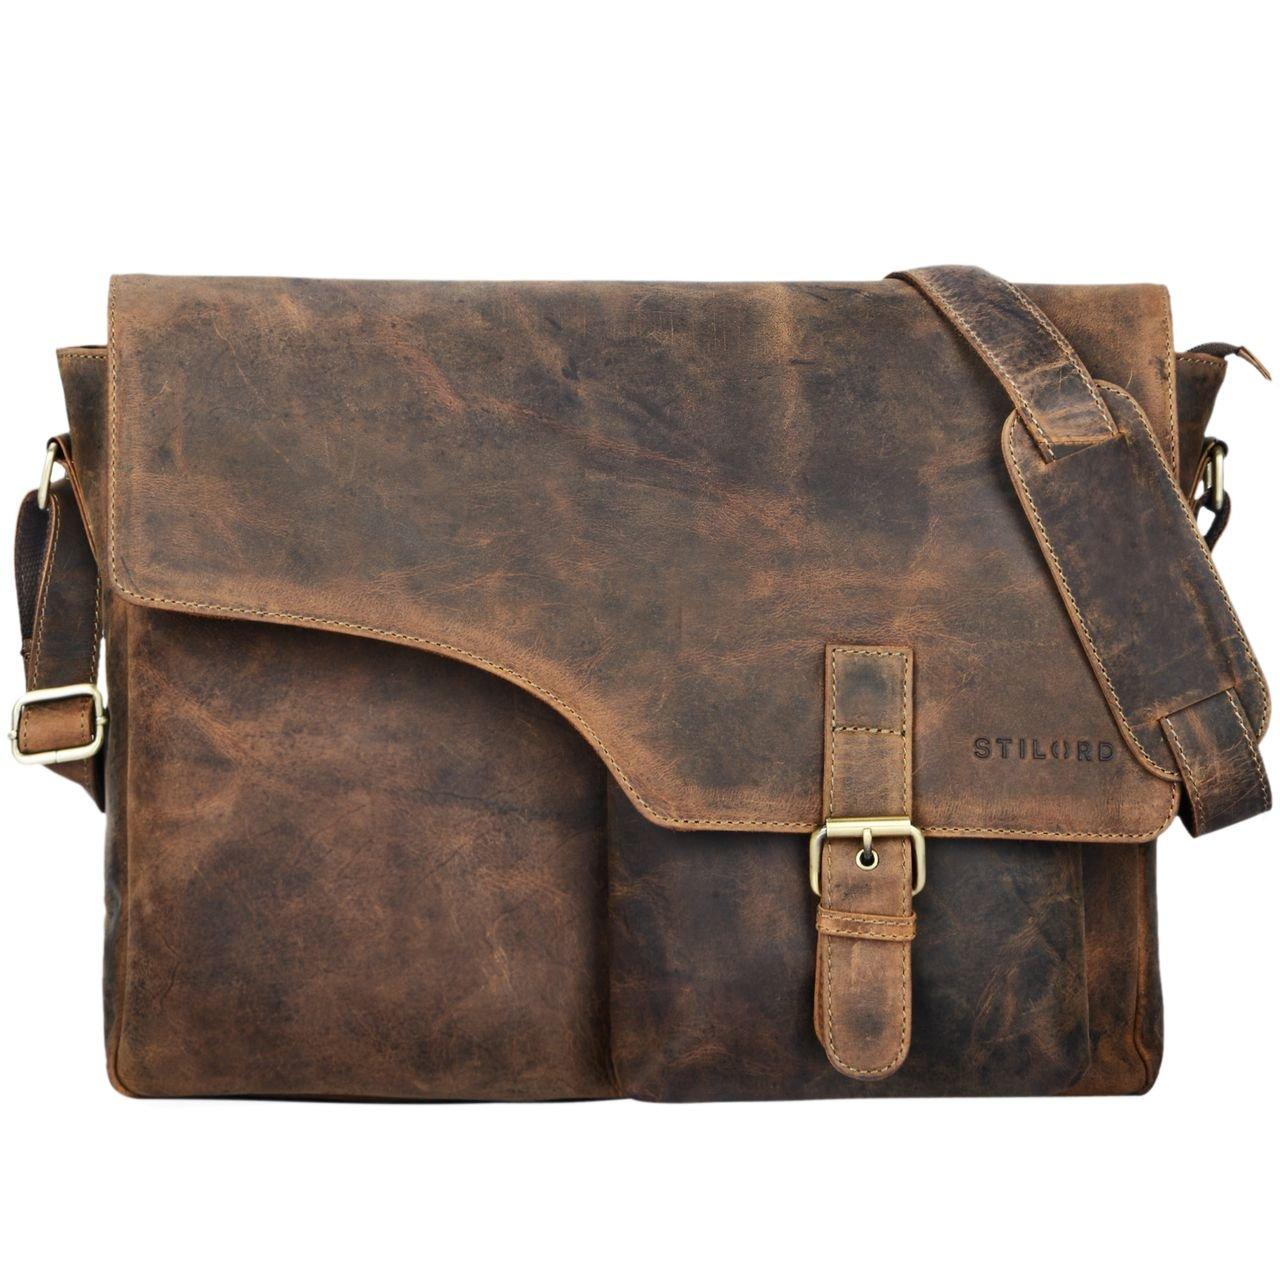 STILORD 'Valerian' Leder Umhängetasche Herren Messenger Bag Business Uni Büro groß DIN A4 Laptoptasche Aktentasche Vintage Rindsleder, Farbe:dunkel - braun